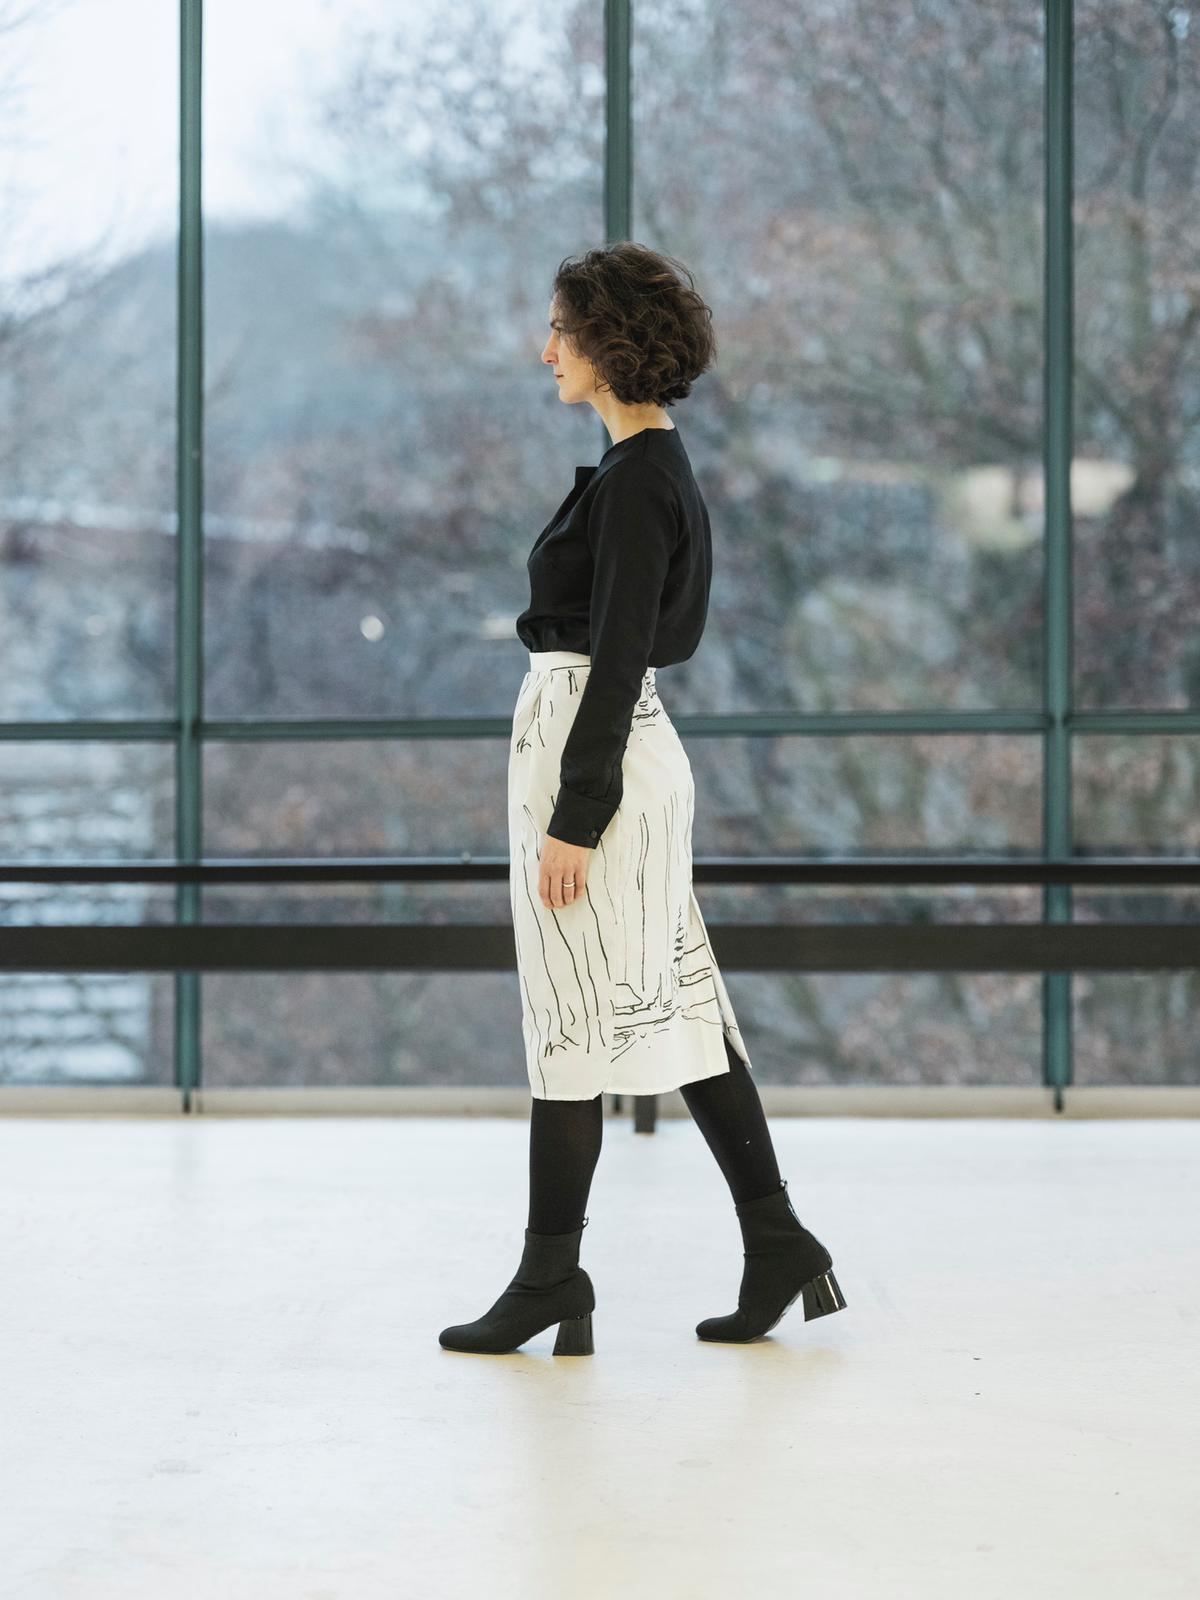 Roberta Organic Fashion Sophia Schneider Esleben Rock Snow2